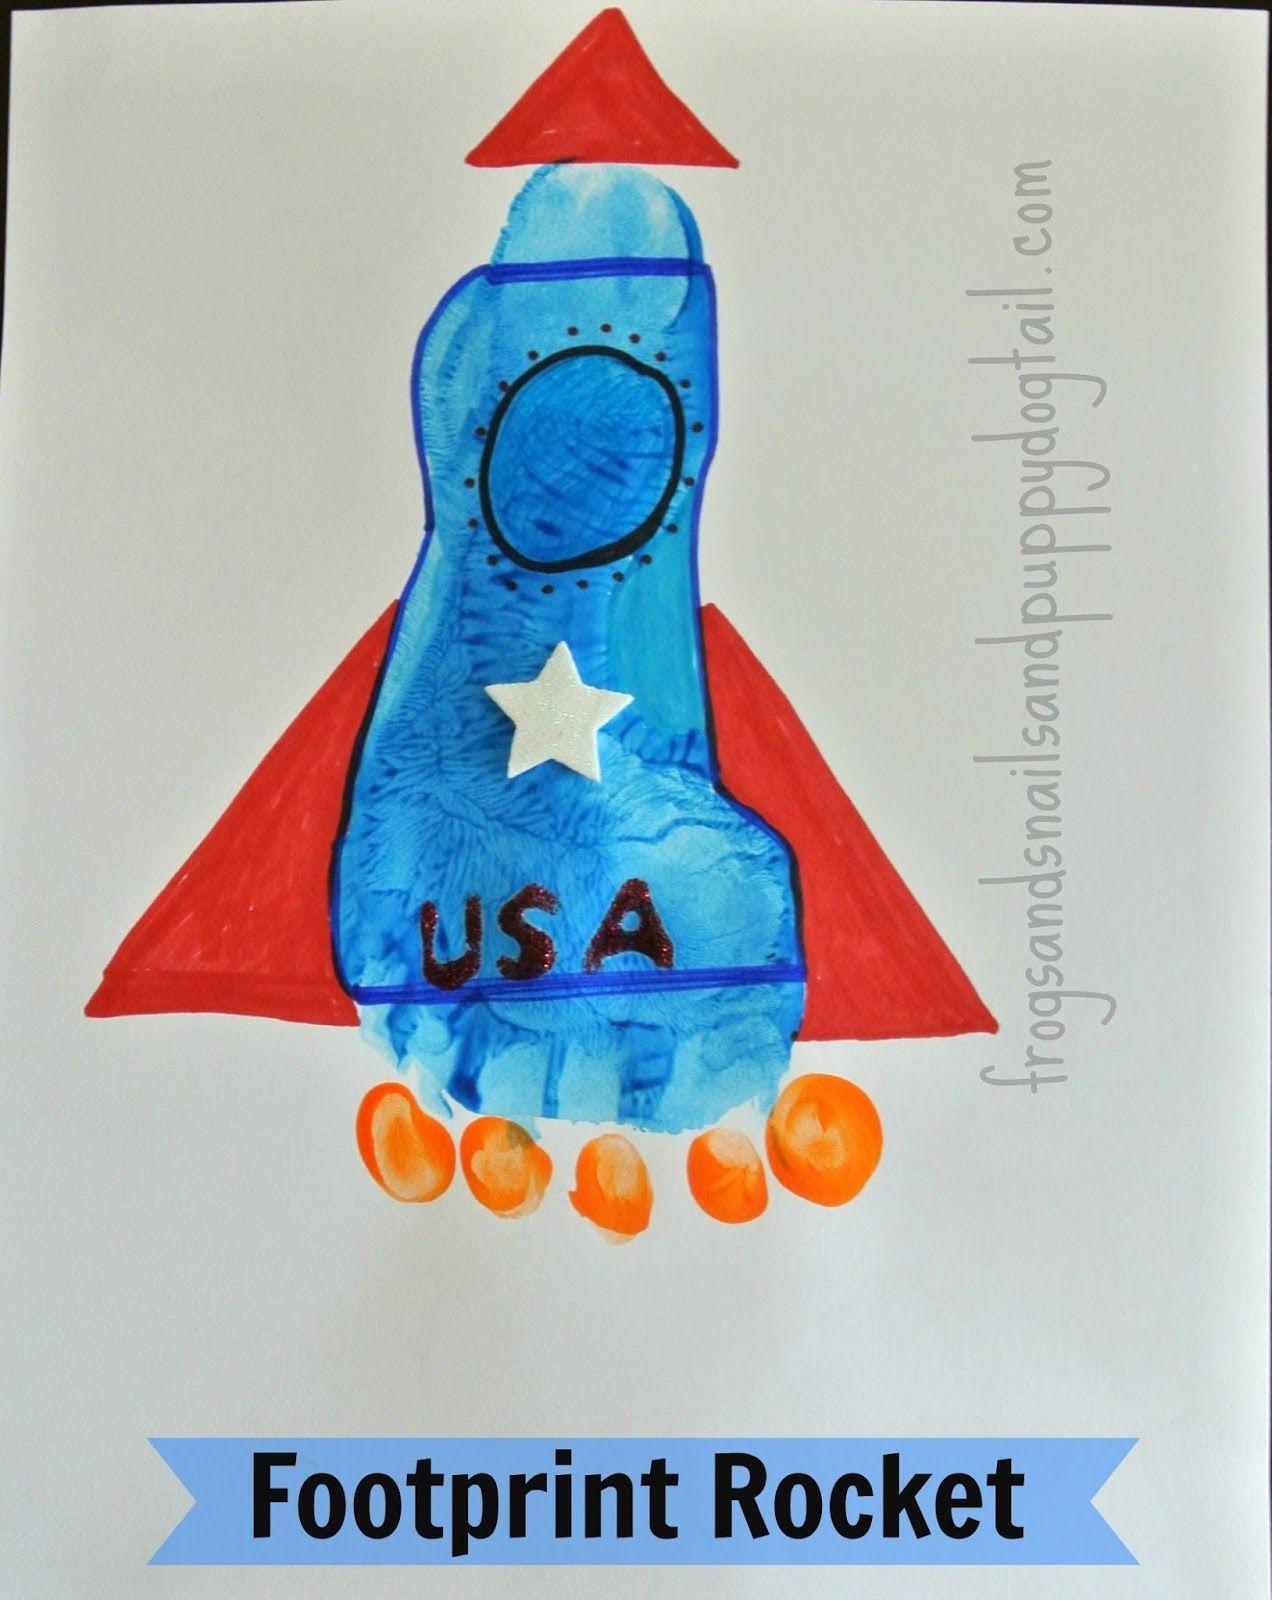 Footprint Rockets